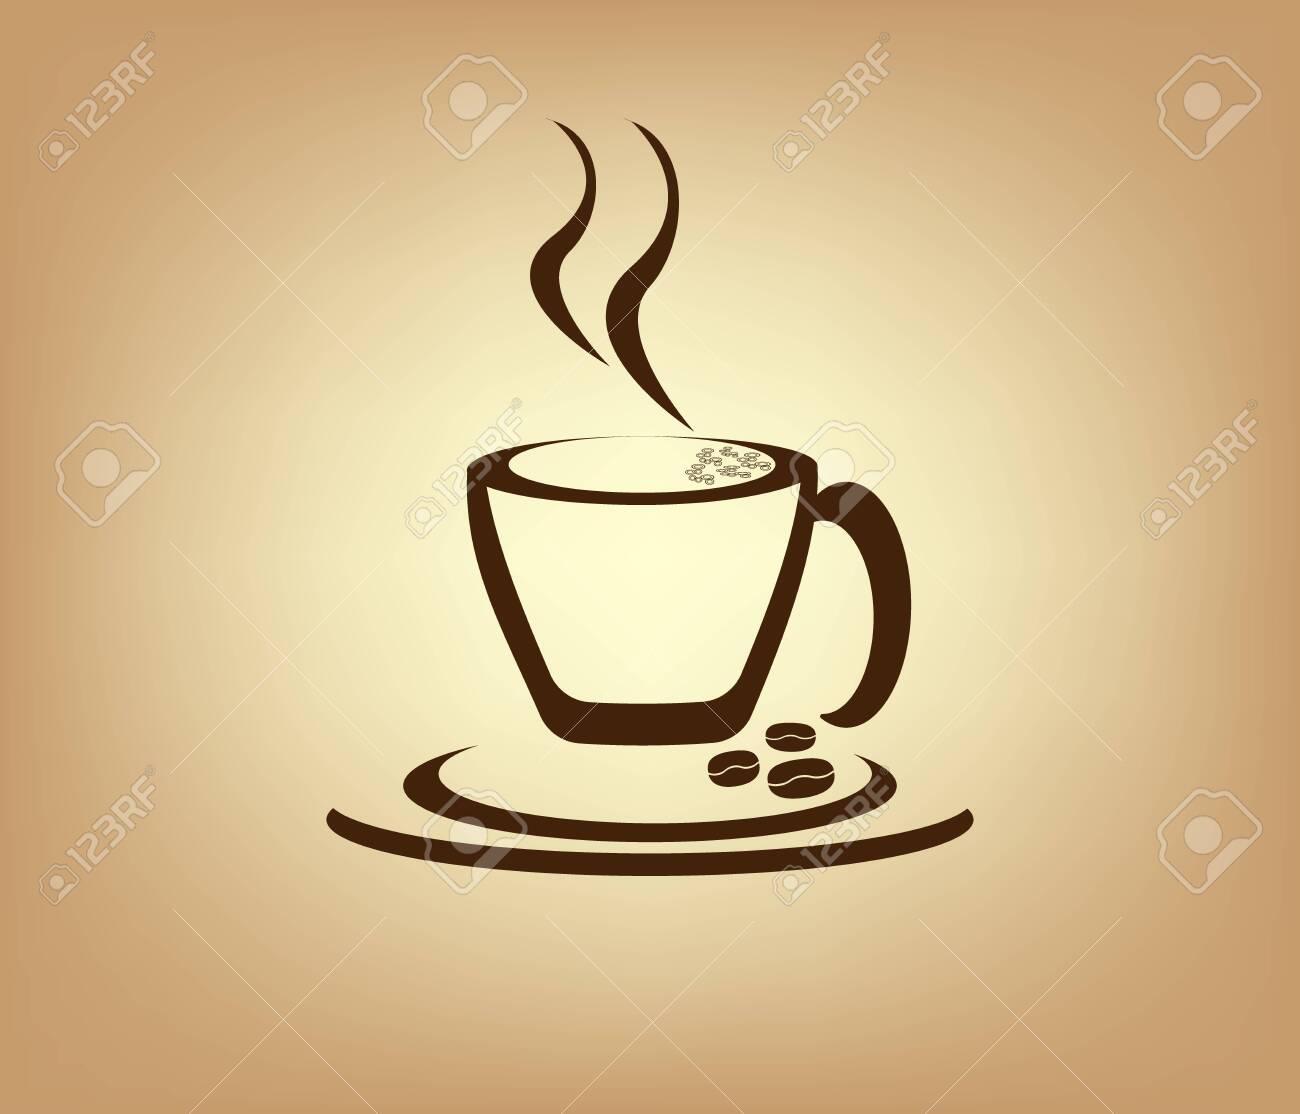 Caffe Logo Design enjoyment background - 147246085